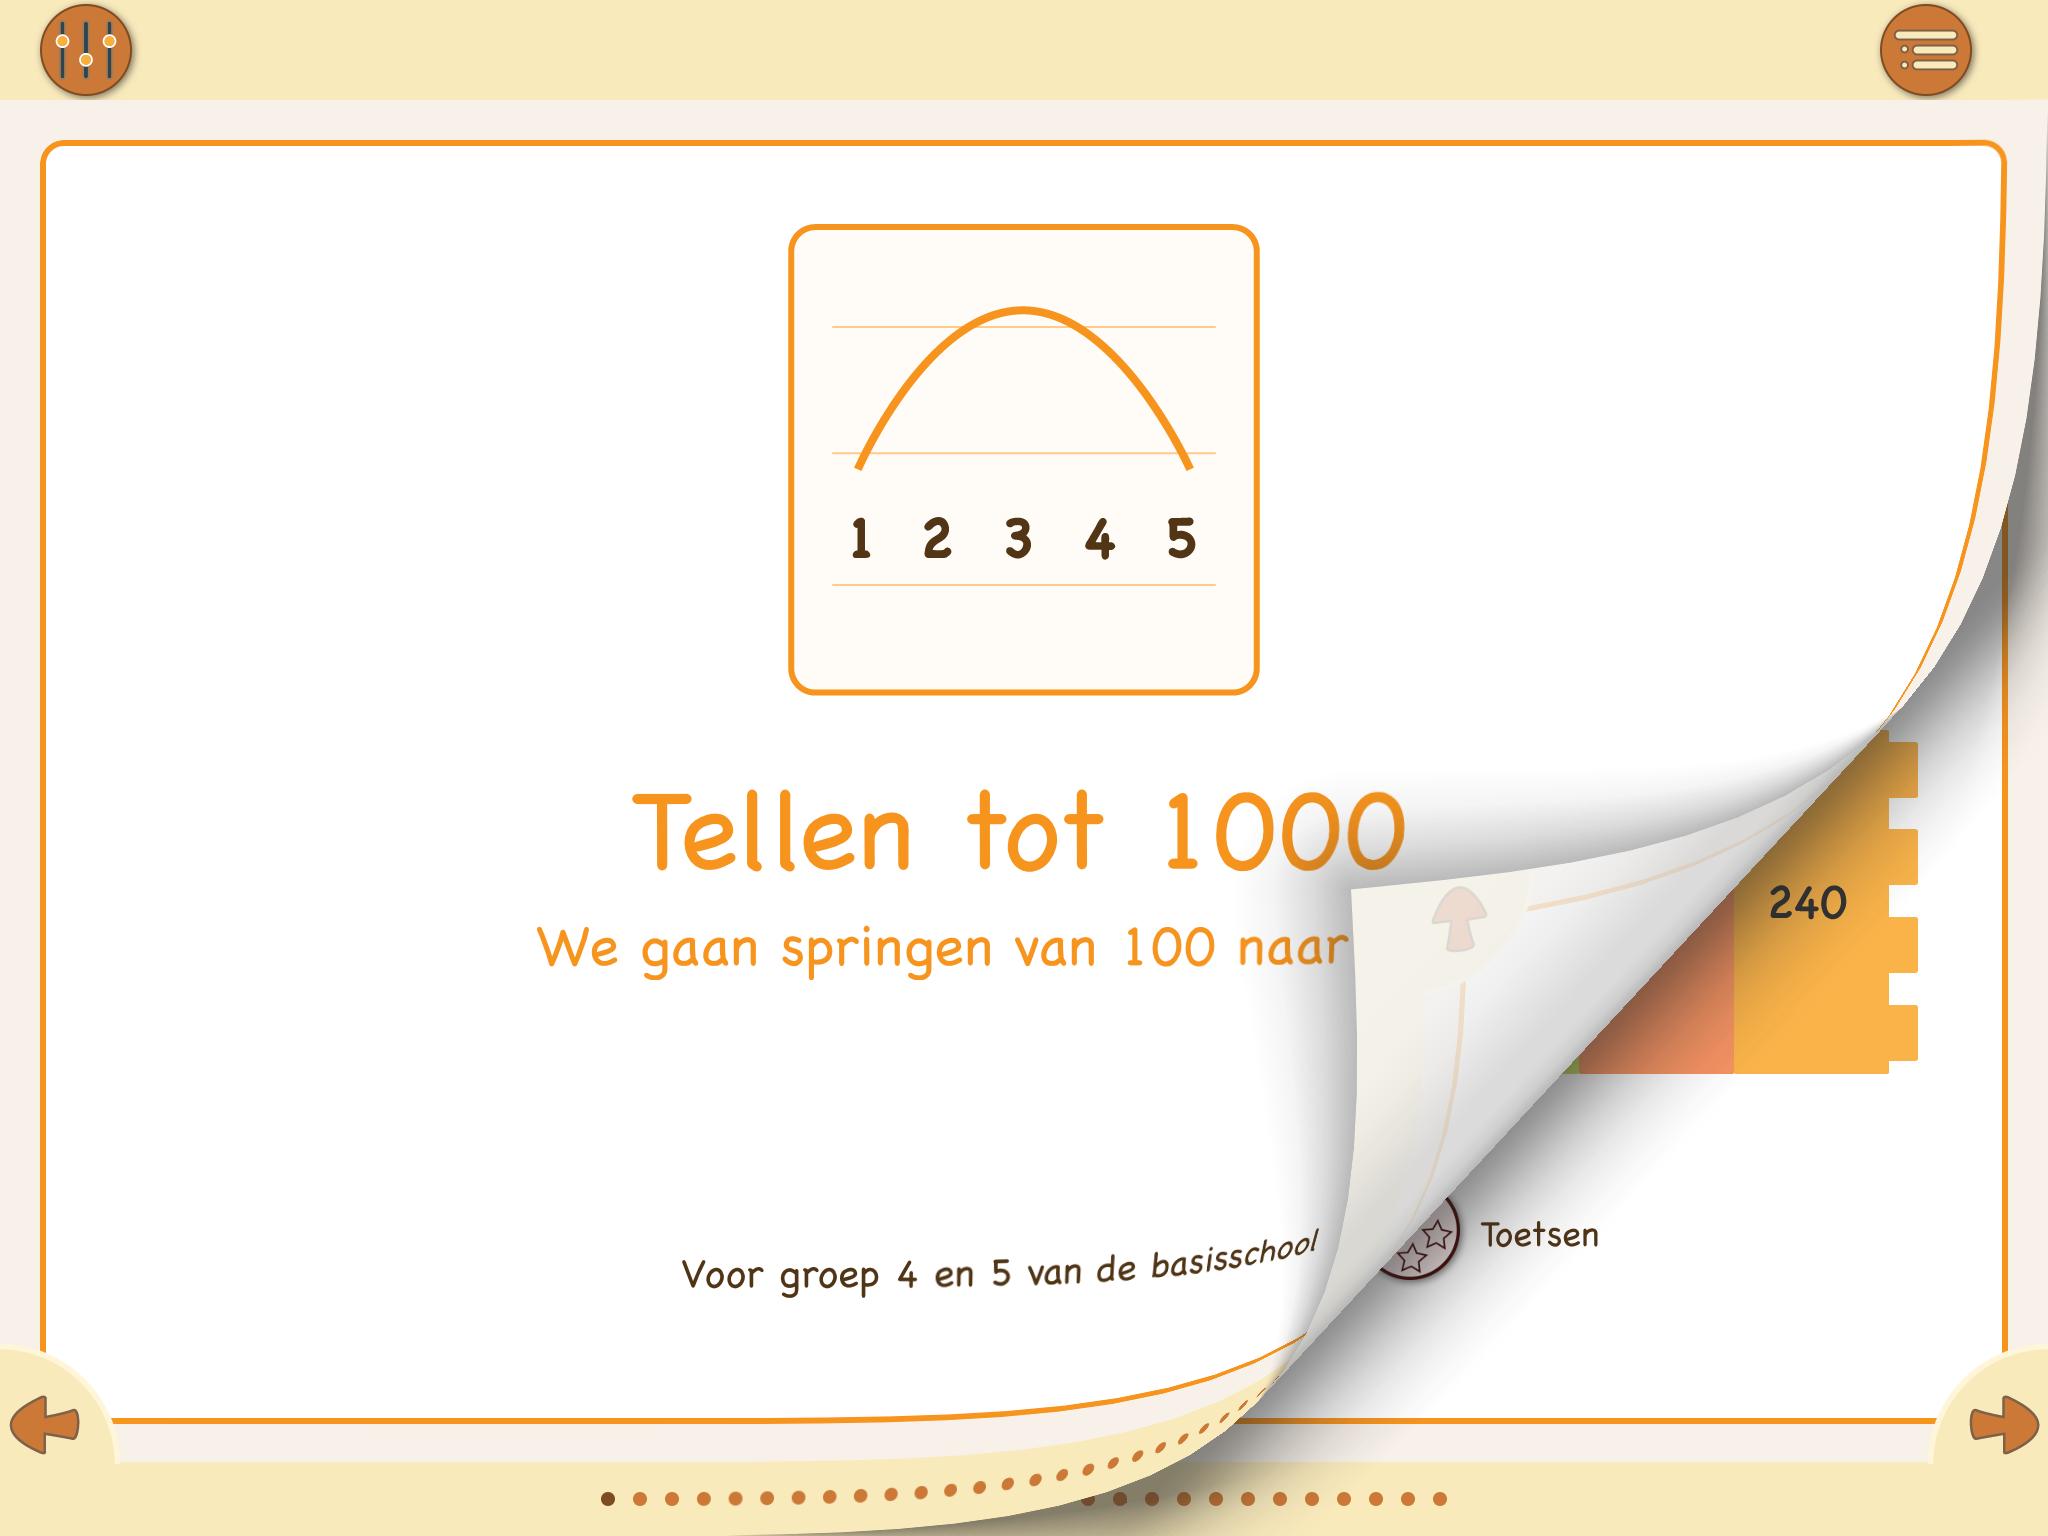 X002-P-nl-02